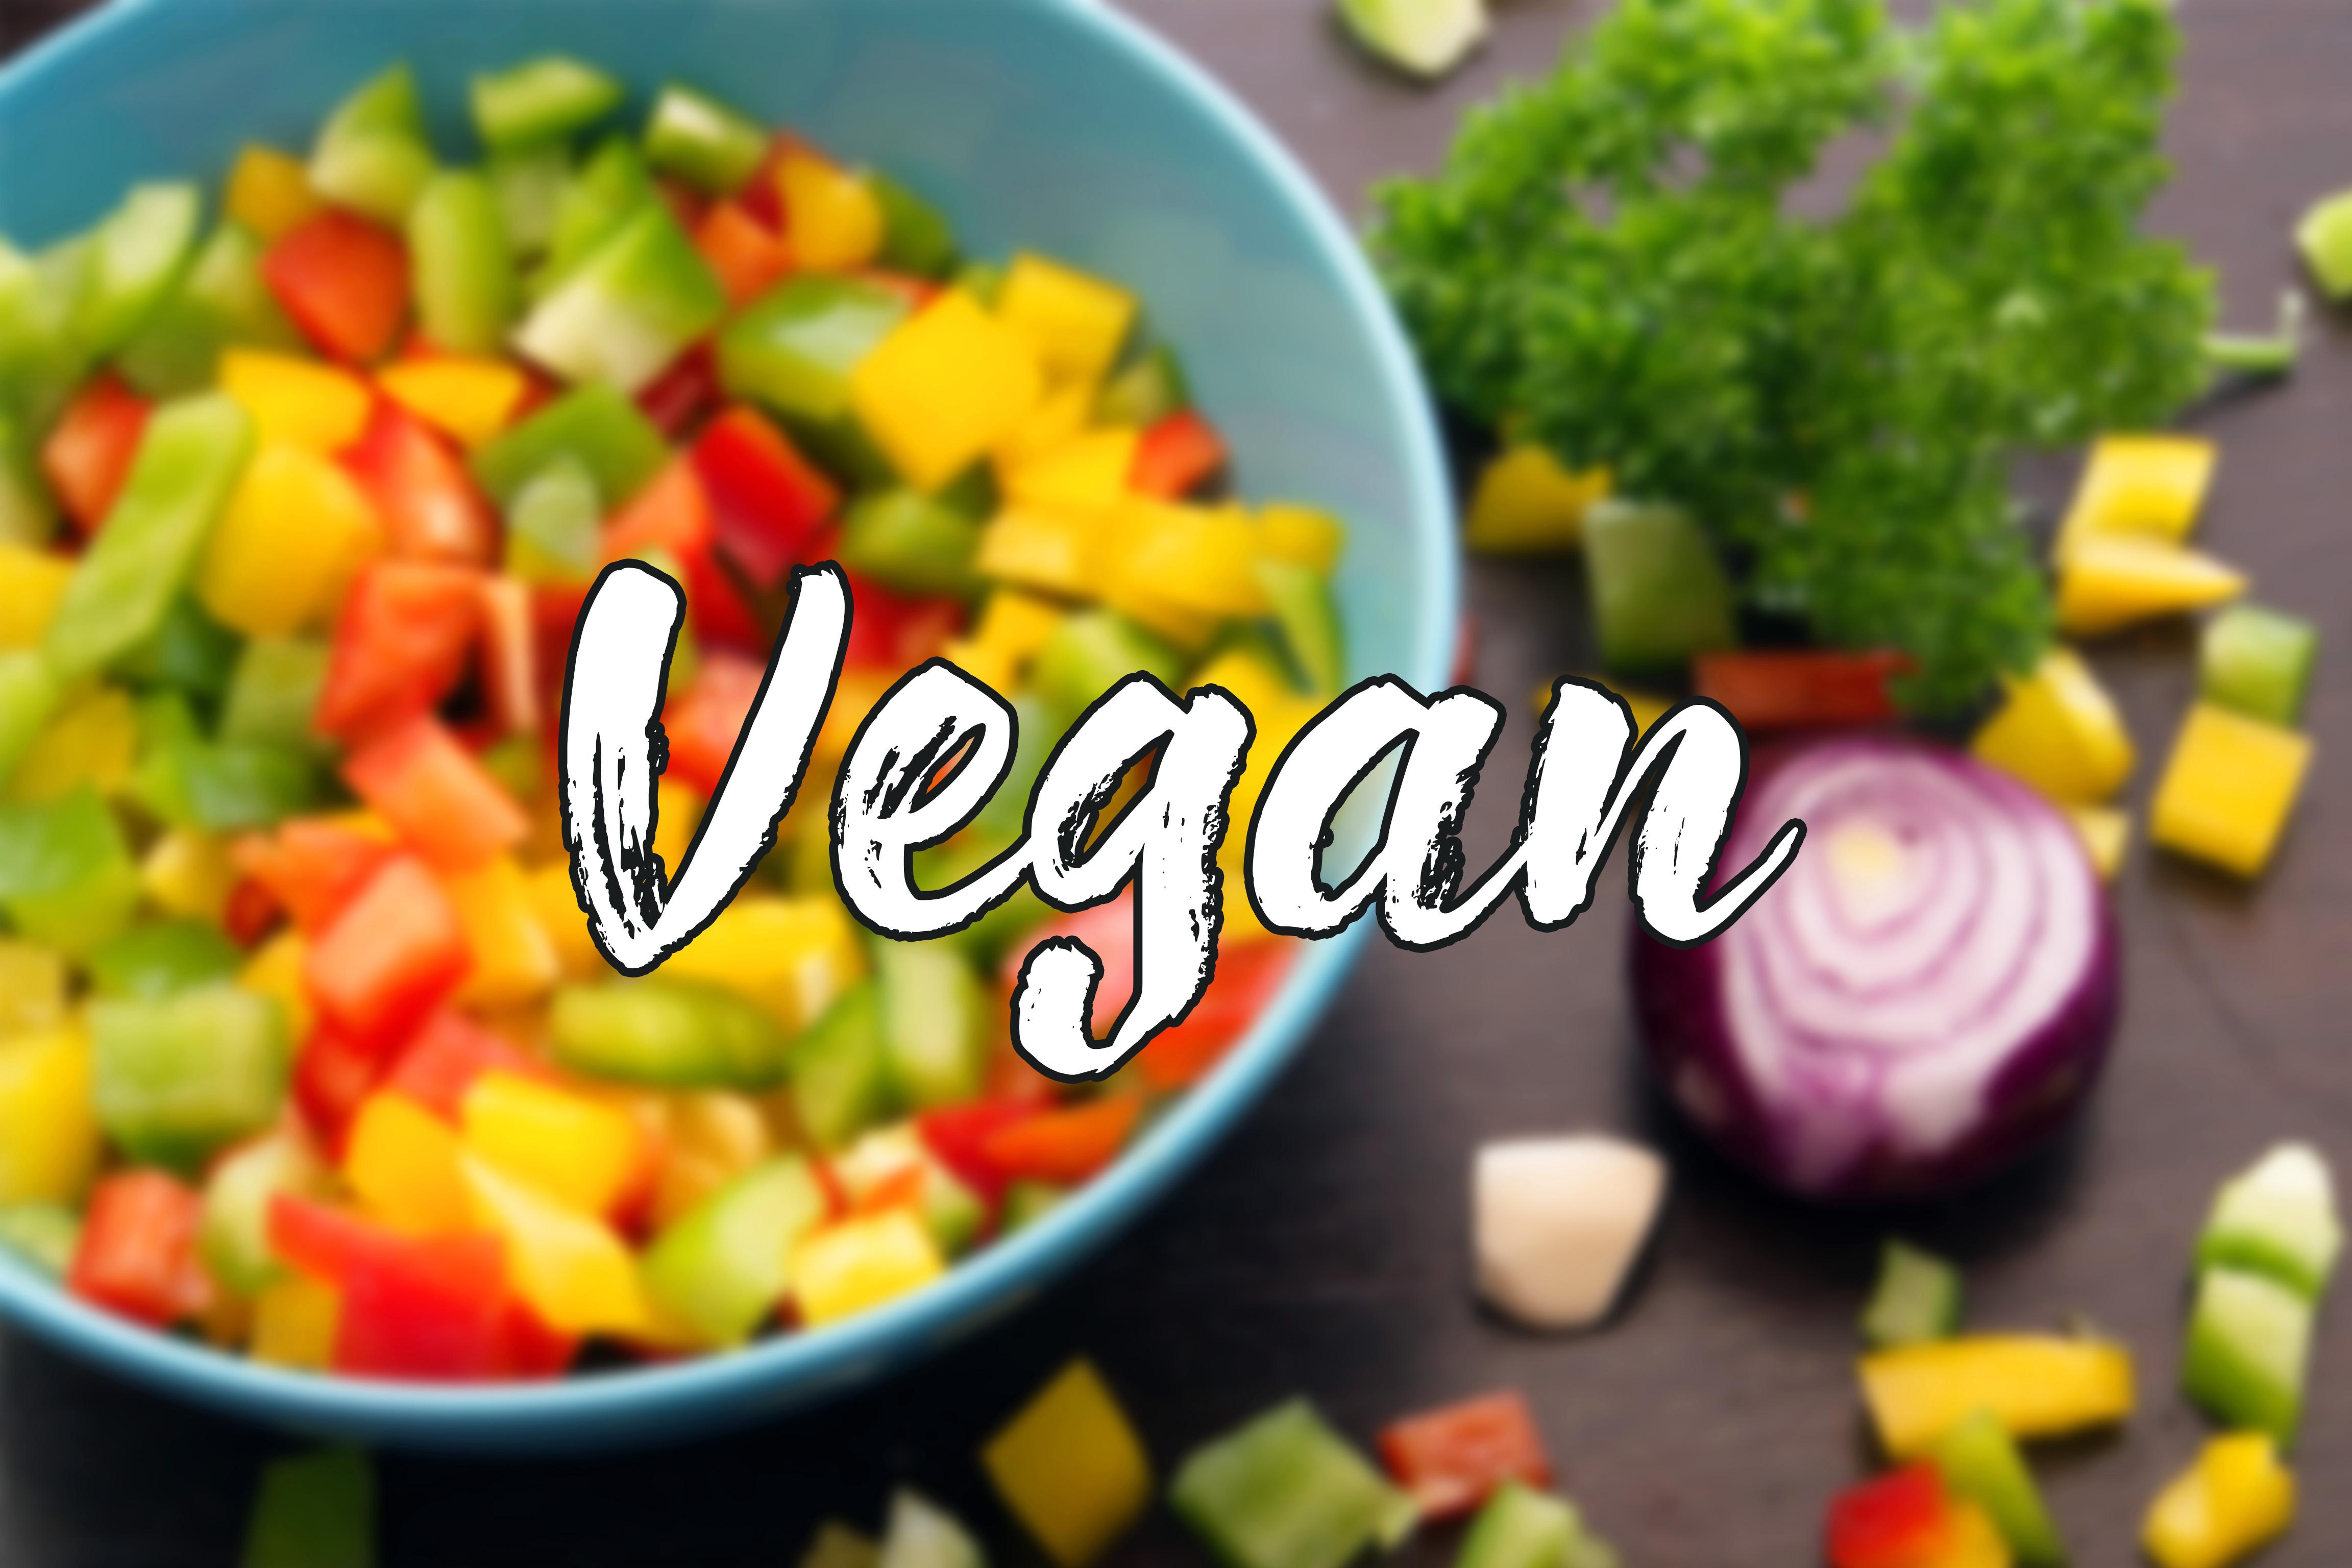 vegane rezepte, vegane ernährung, vegan kochen, was koche ich heute, vegan, rezeptideen